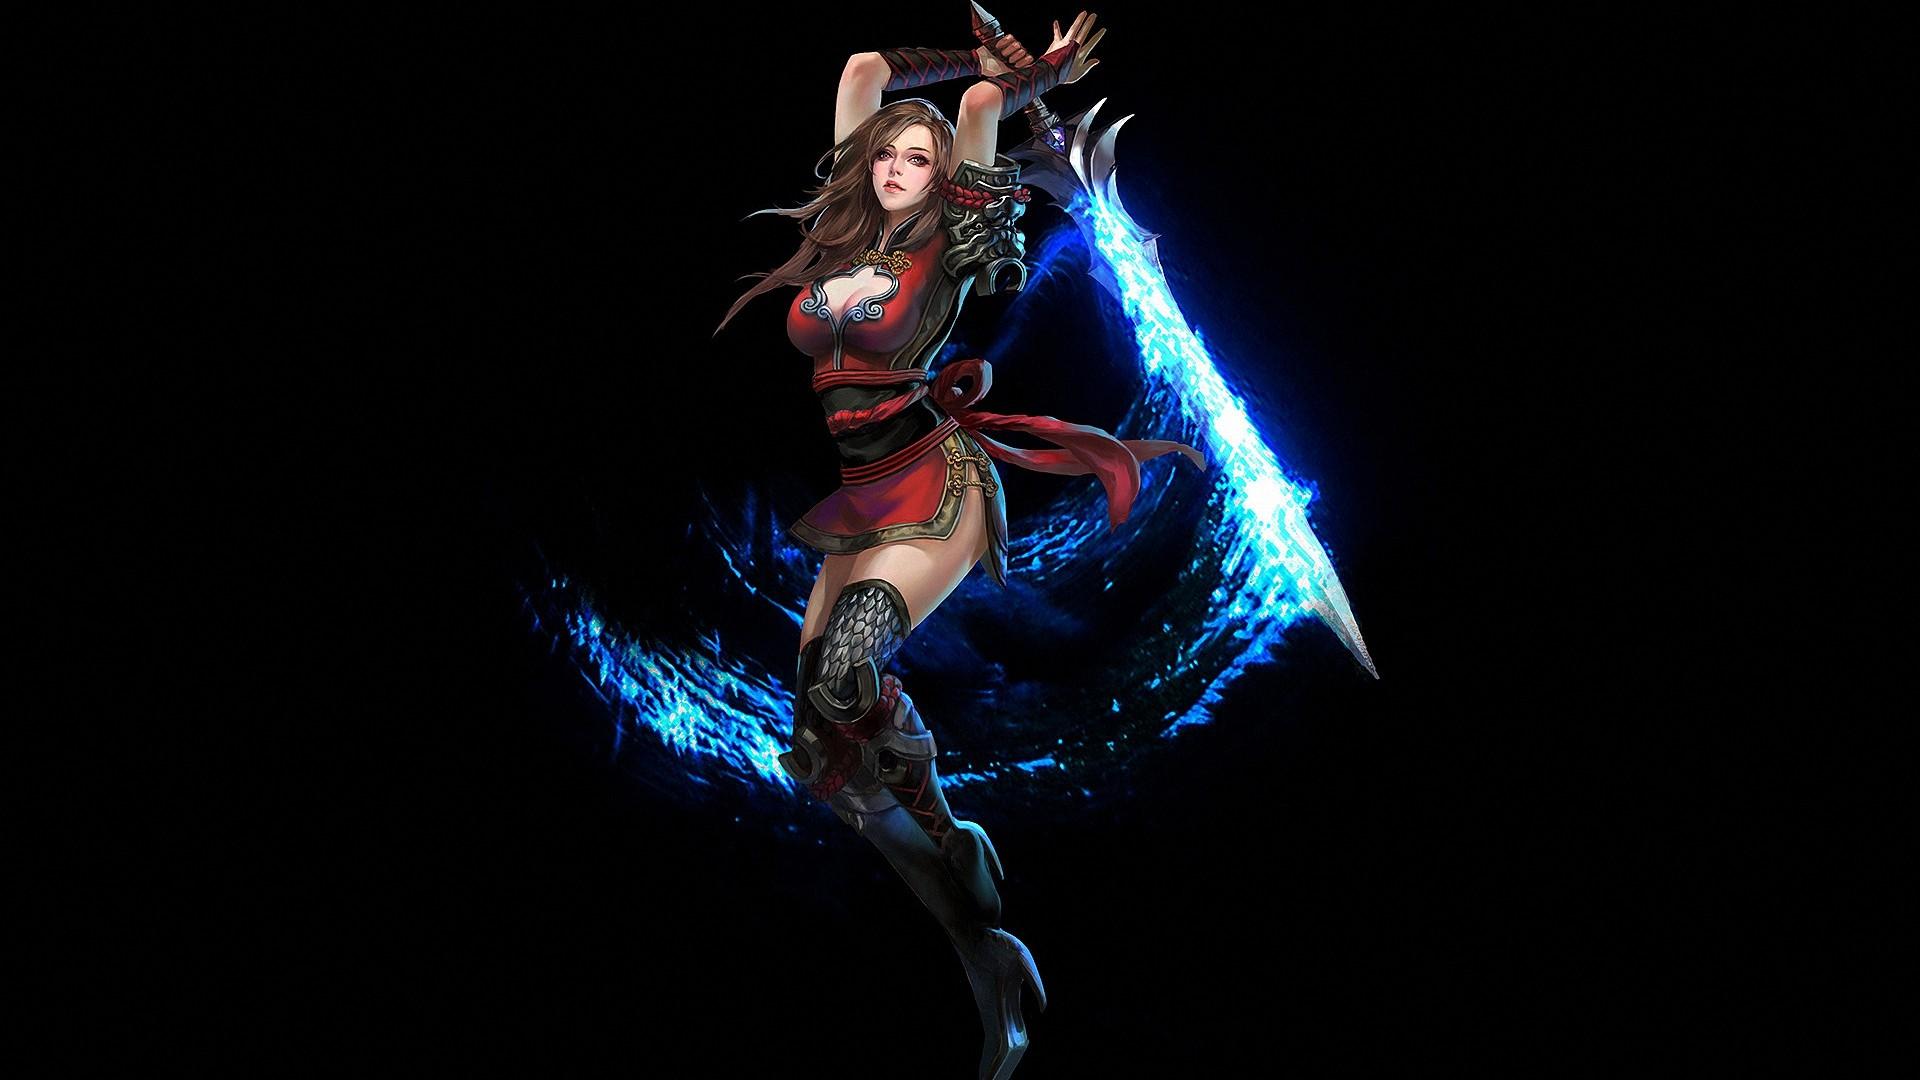 Fantasy warrior hd wallpaper background image - Girl with sword wallpaper ...